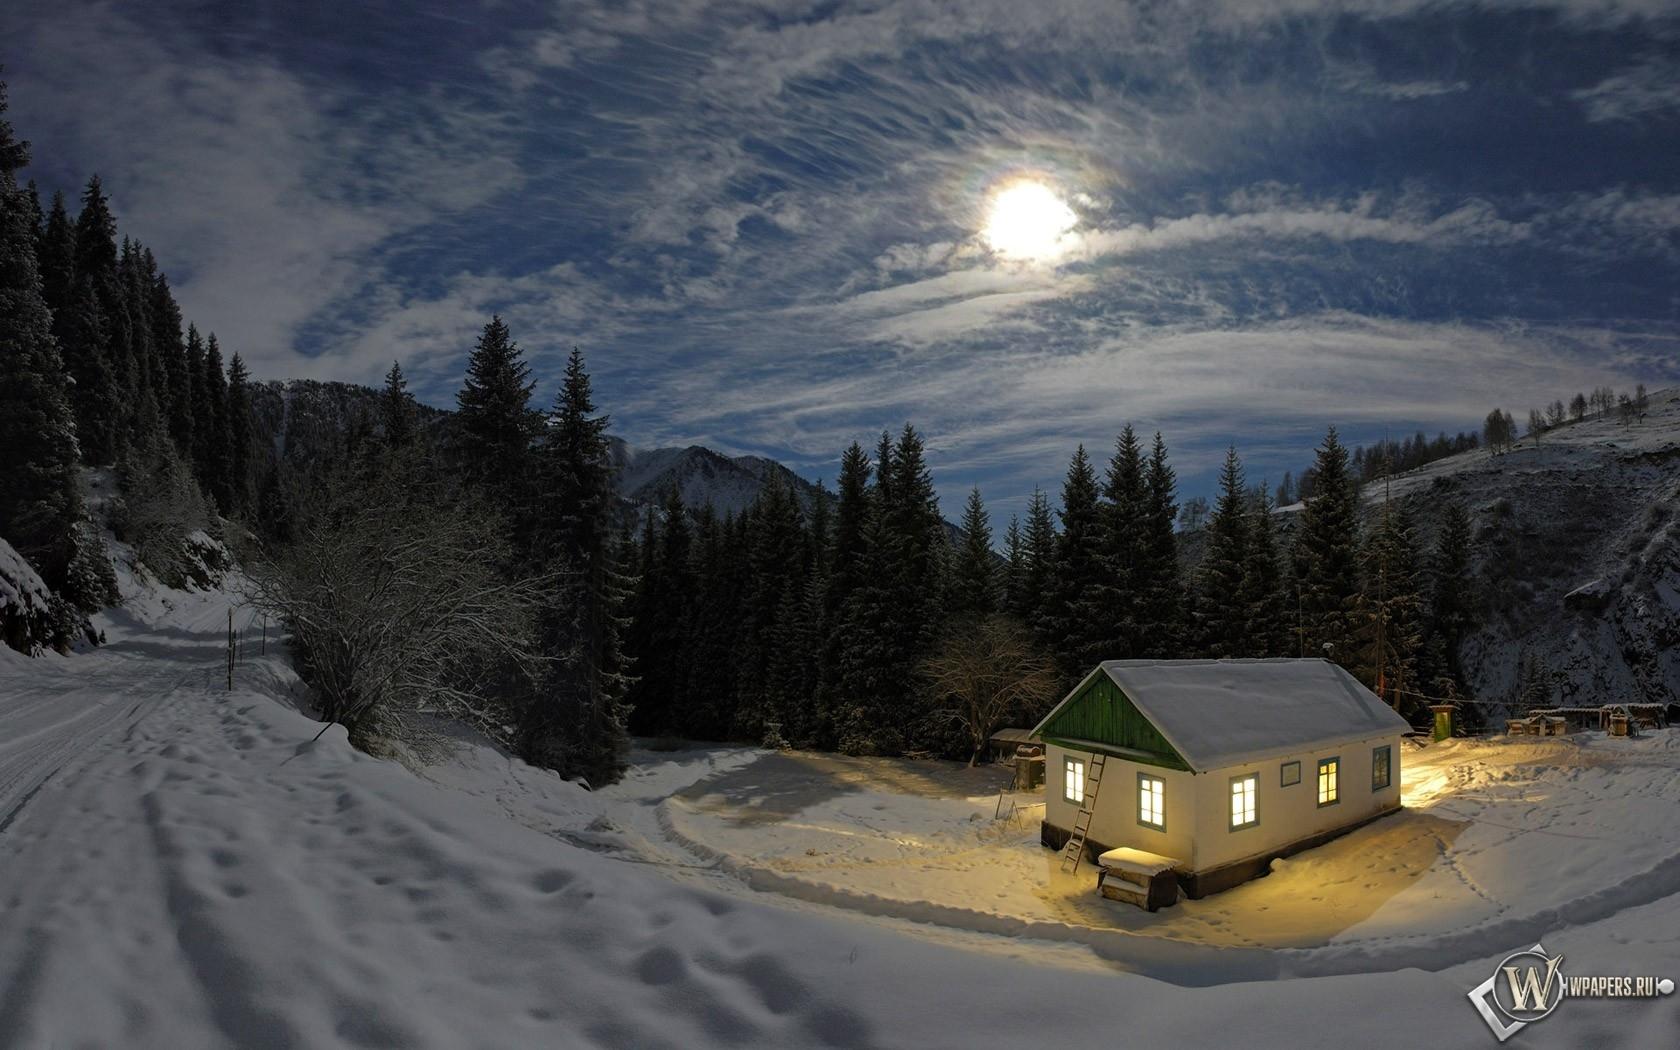 Домик в снежном лесу 1680x1050